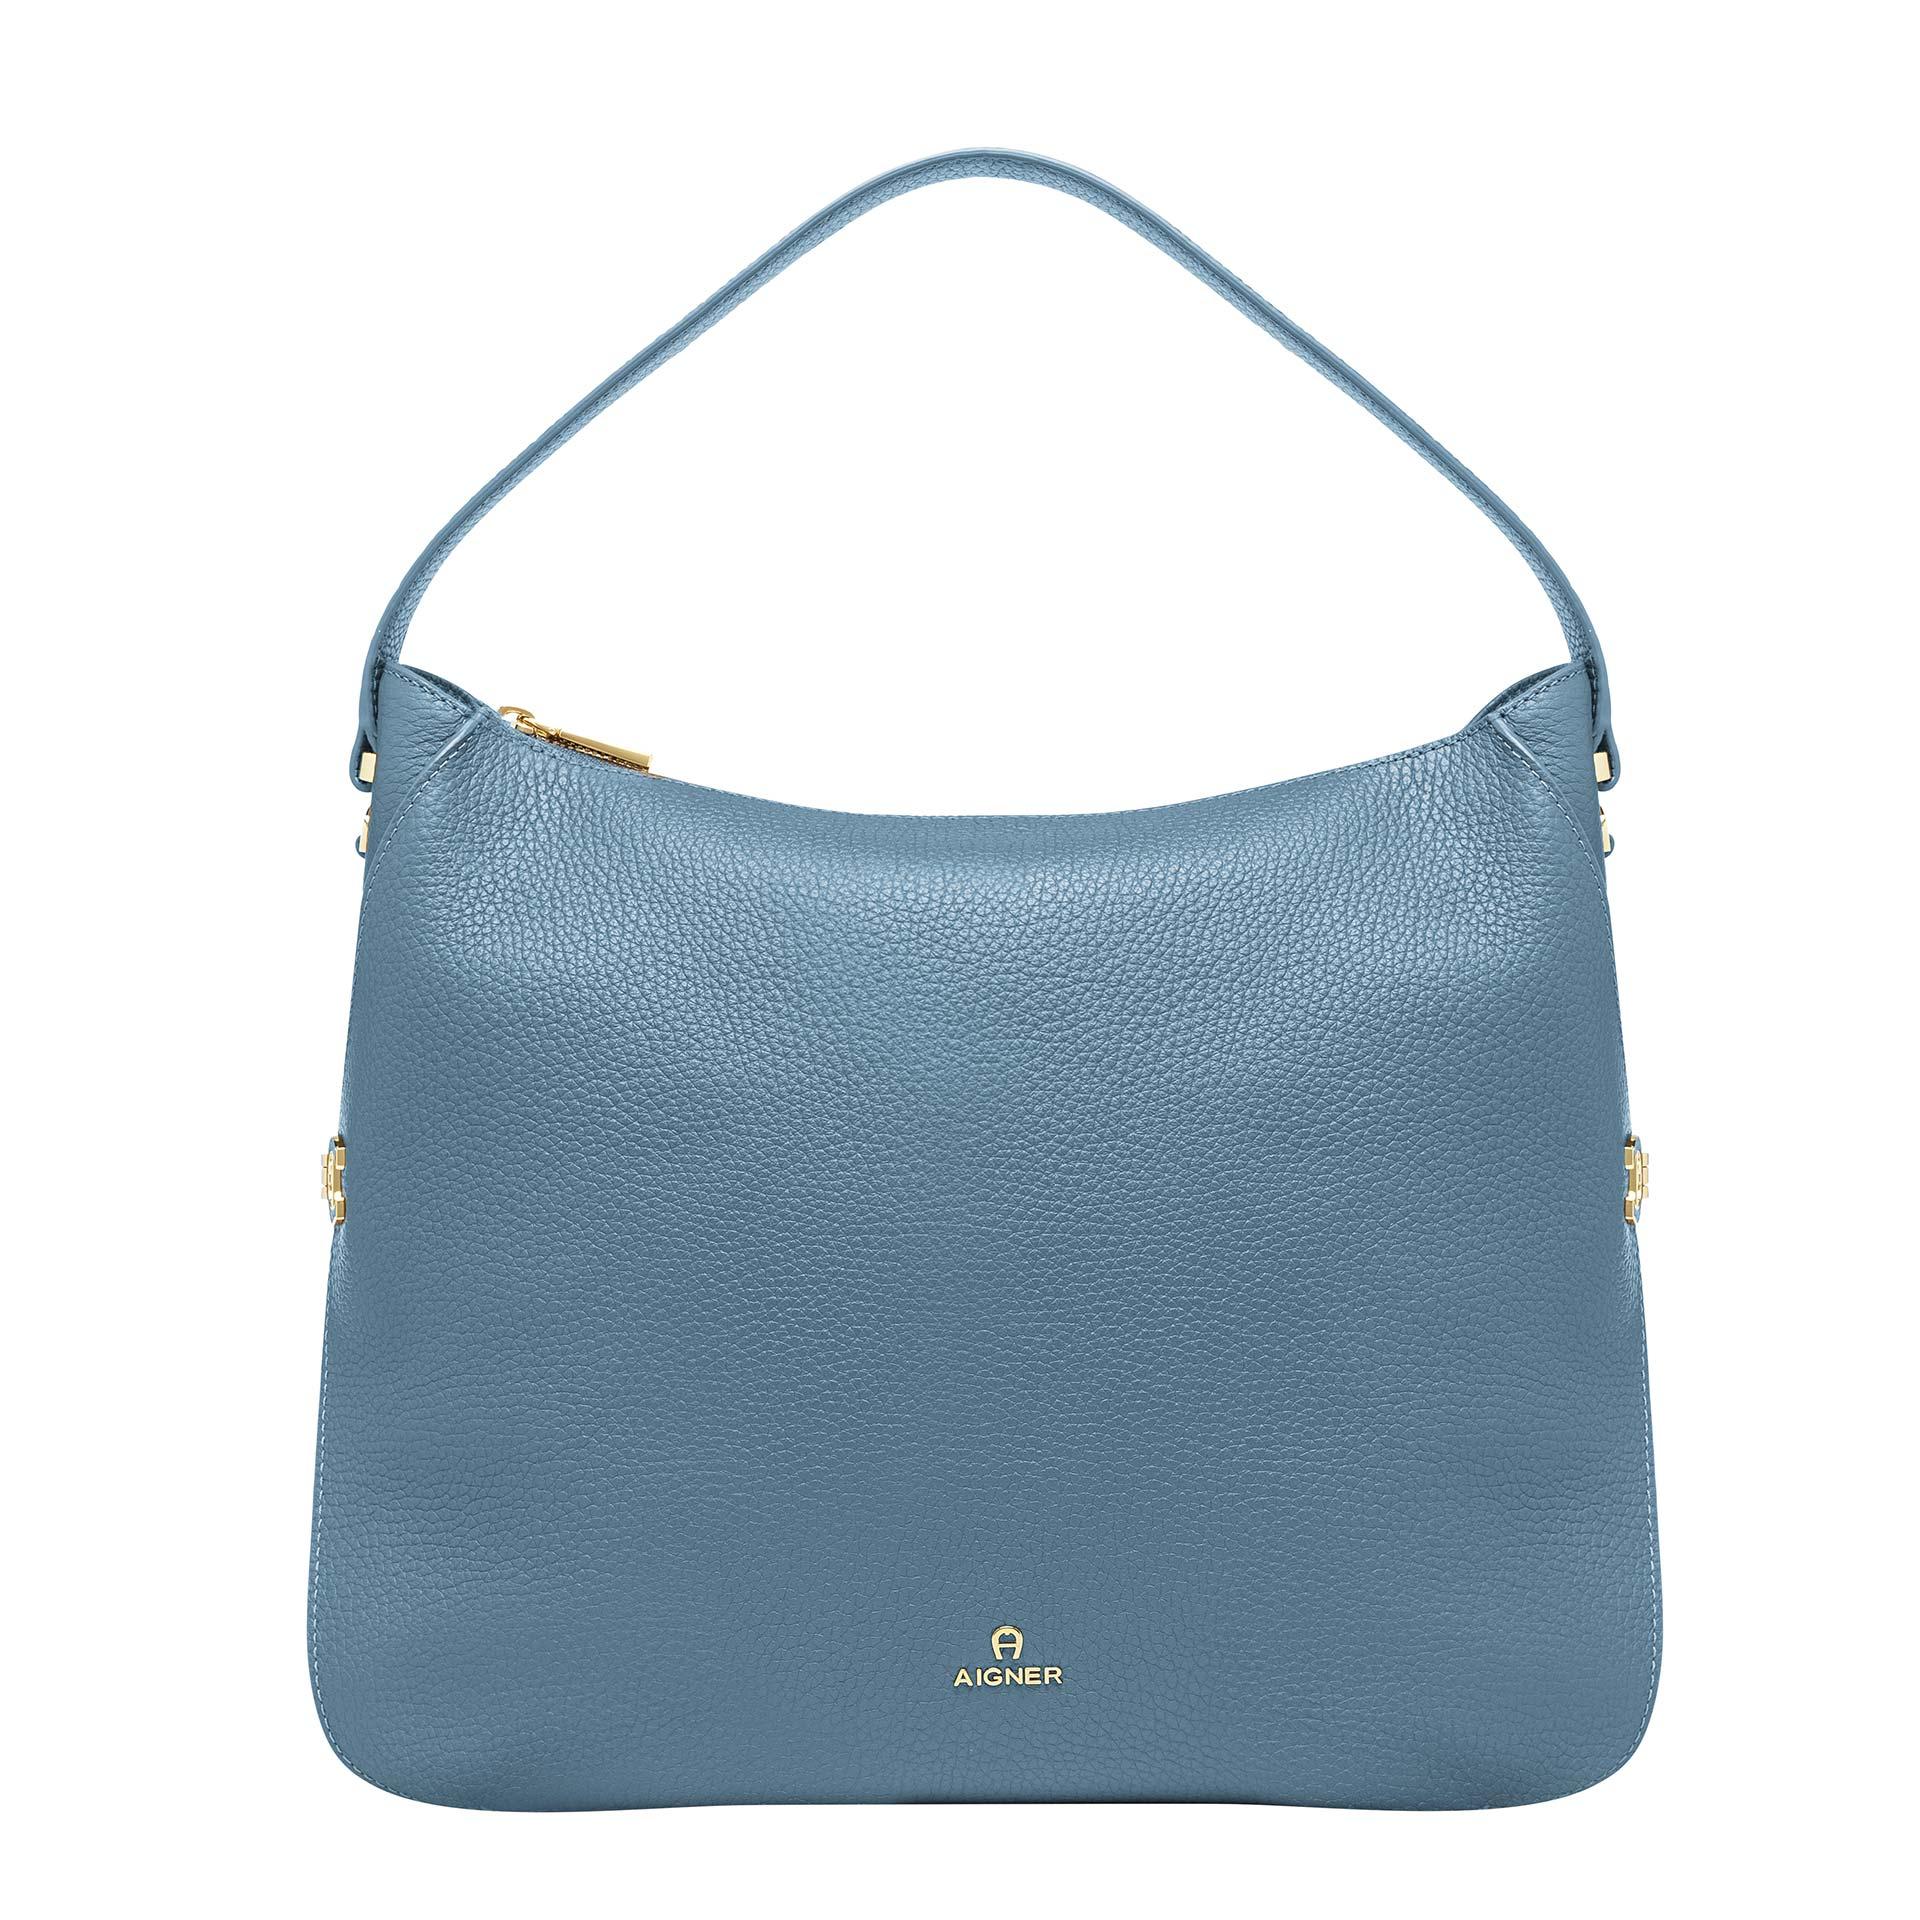 Aigner Milano Beuteltasche M dusk blue